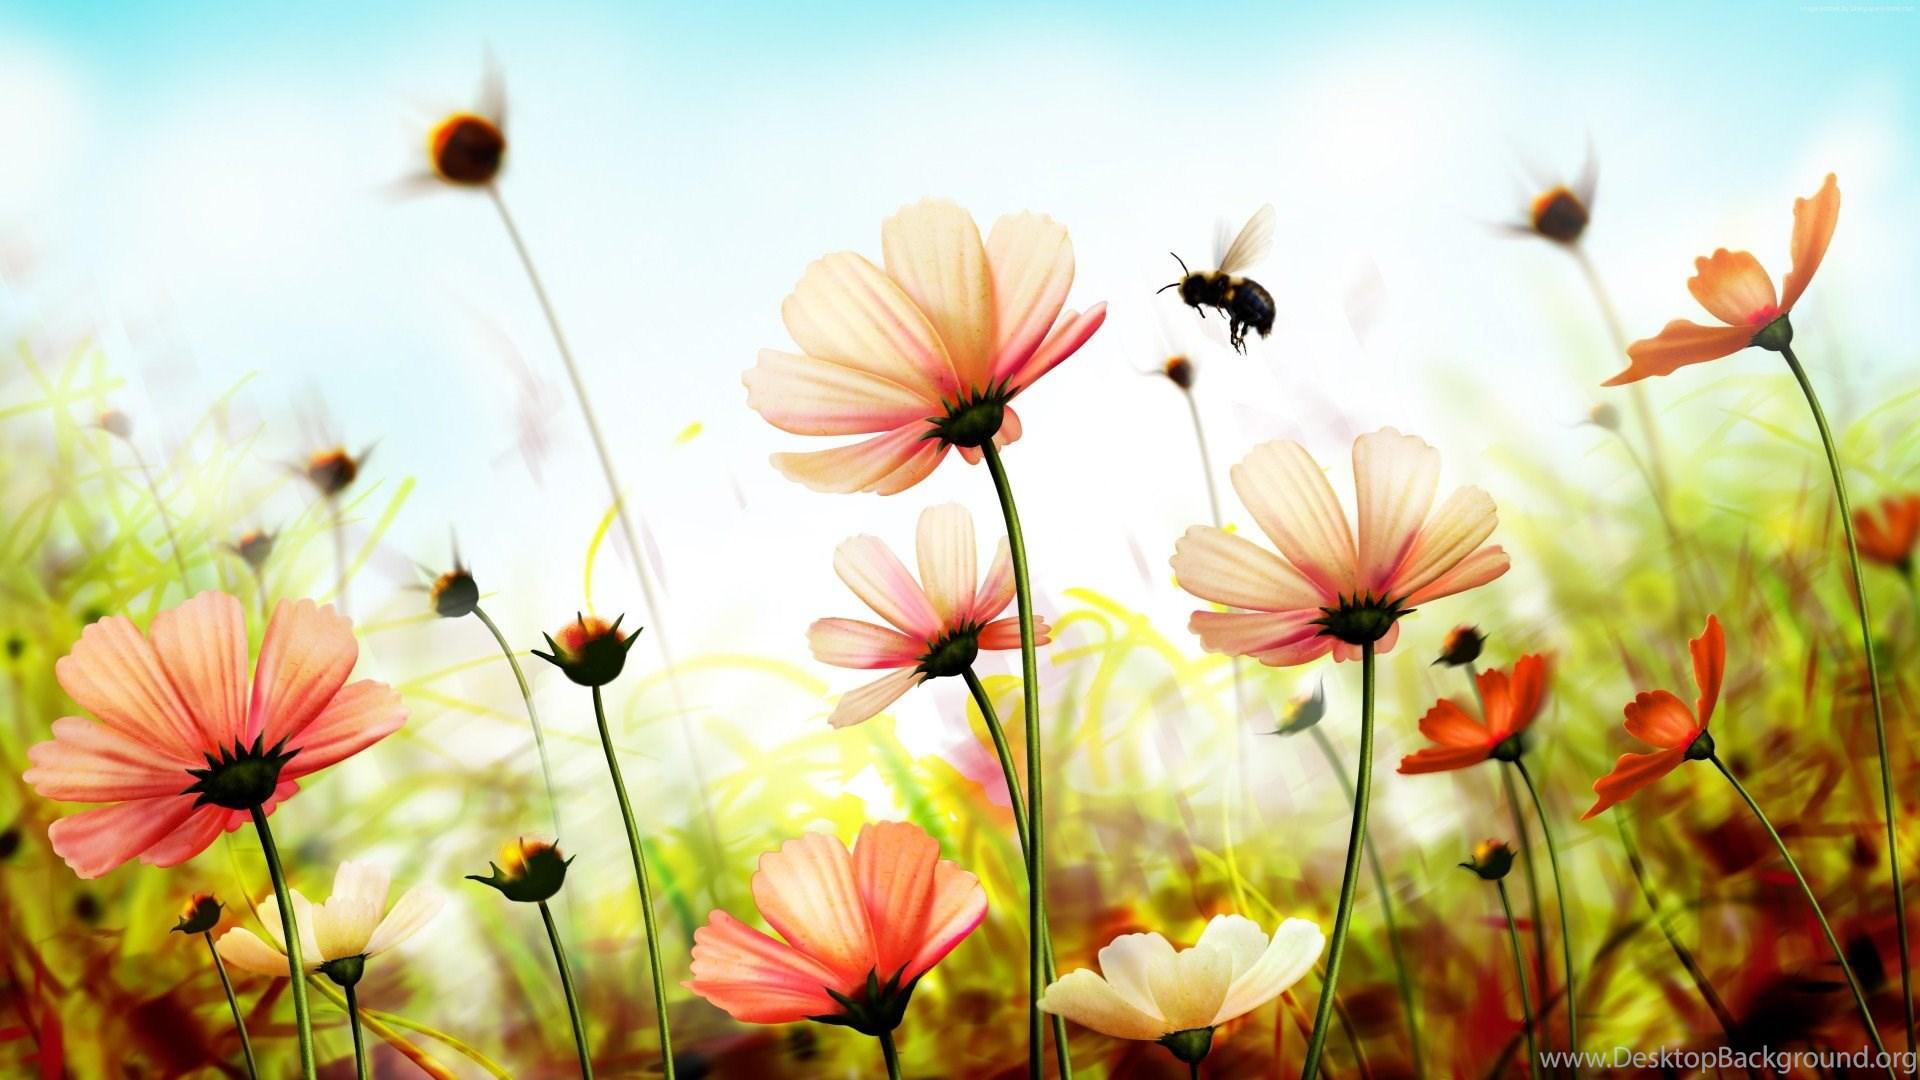 Nature flowers wallpapers hd wallpapers desktop background popular voltagebd Images